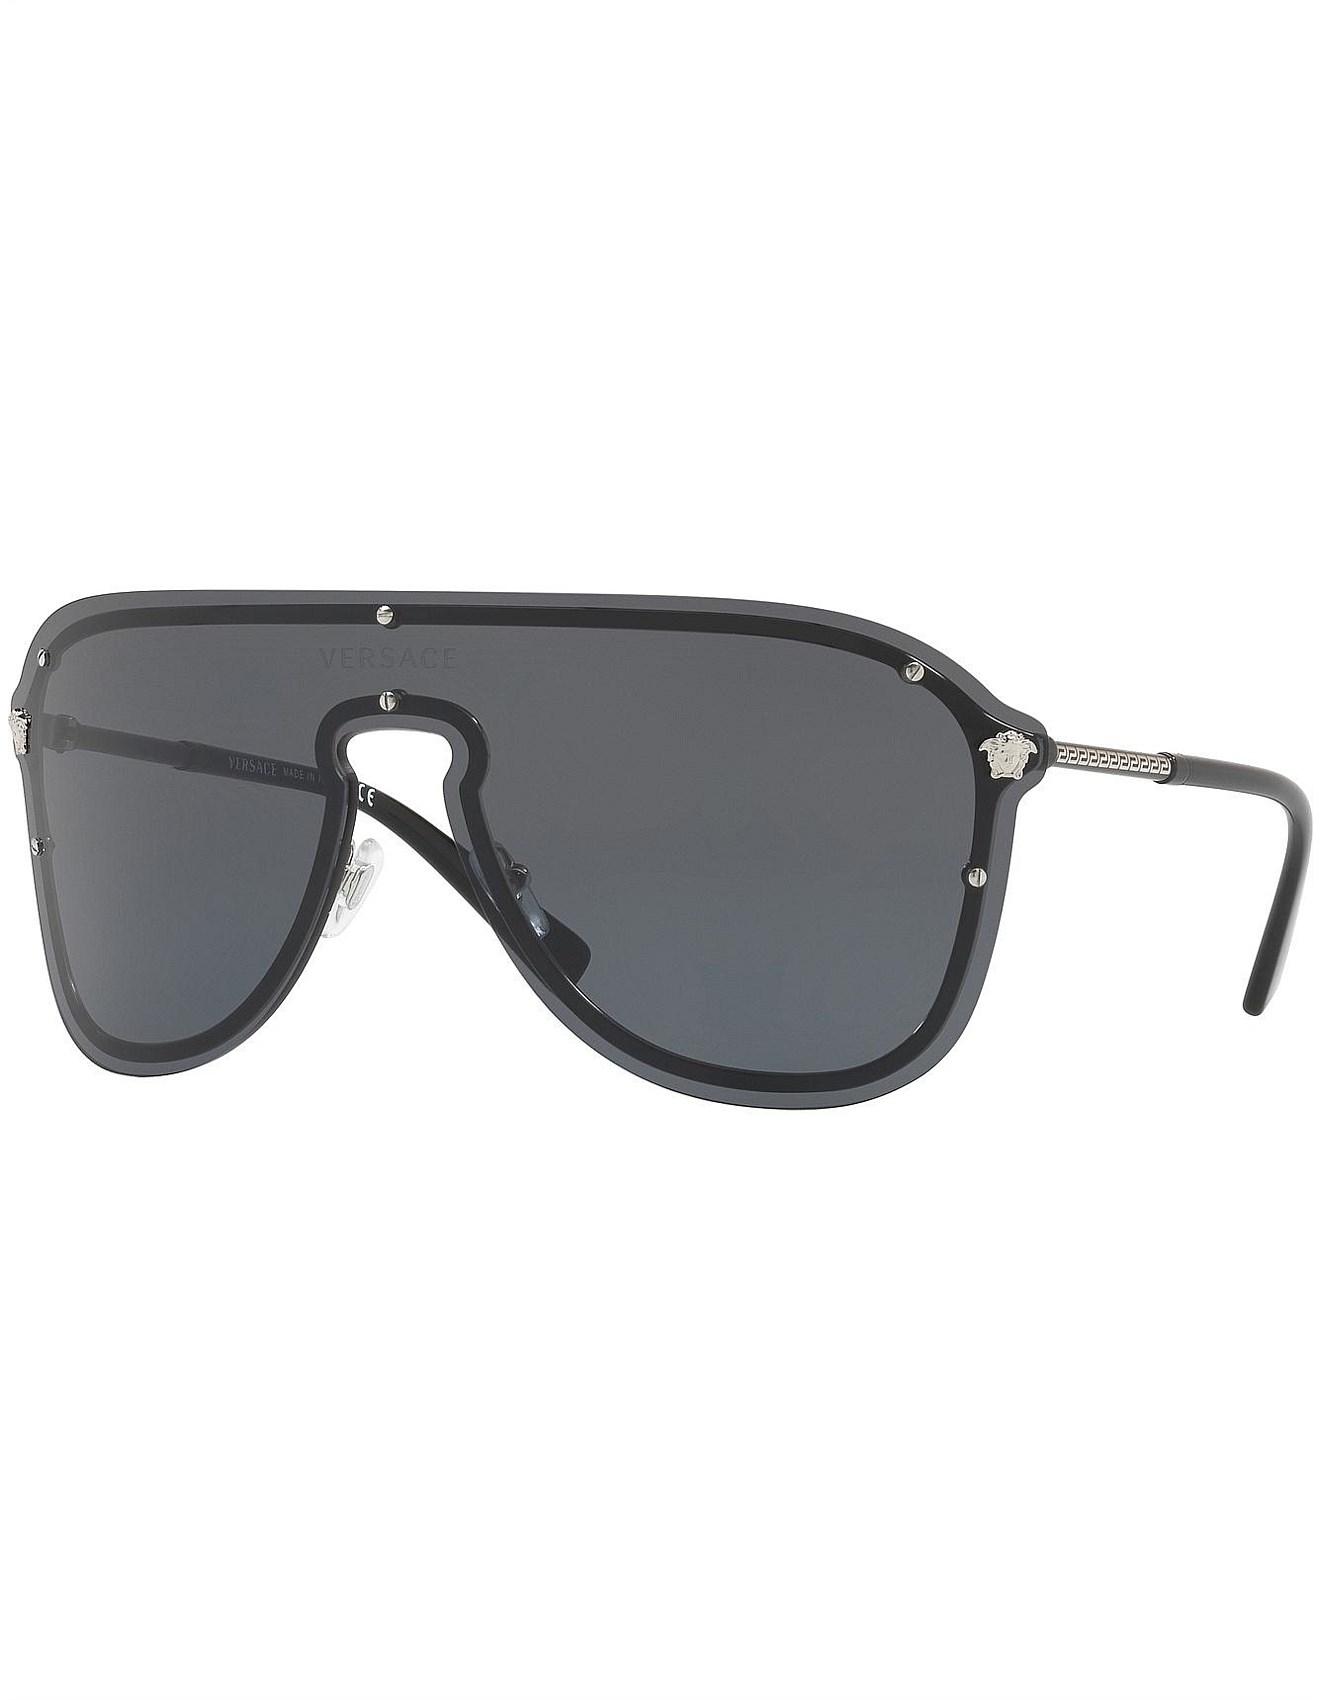 a83a9db708 Women s Aviator Sunglasses